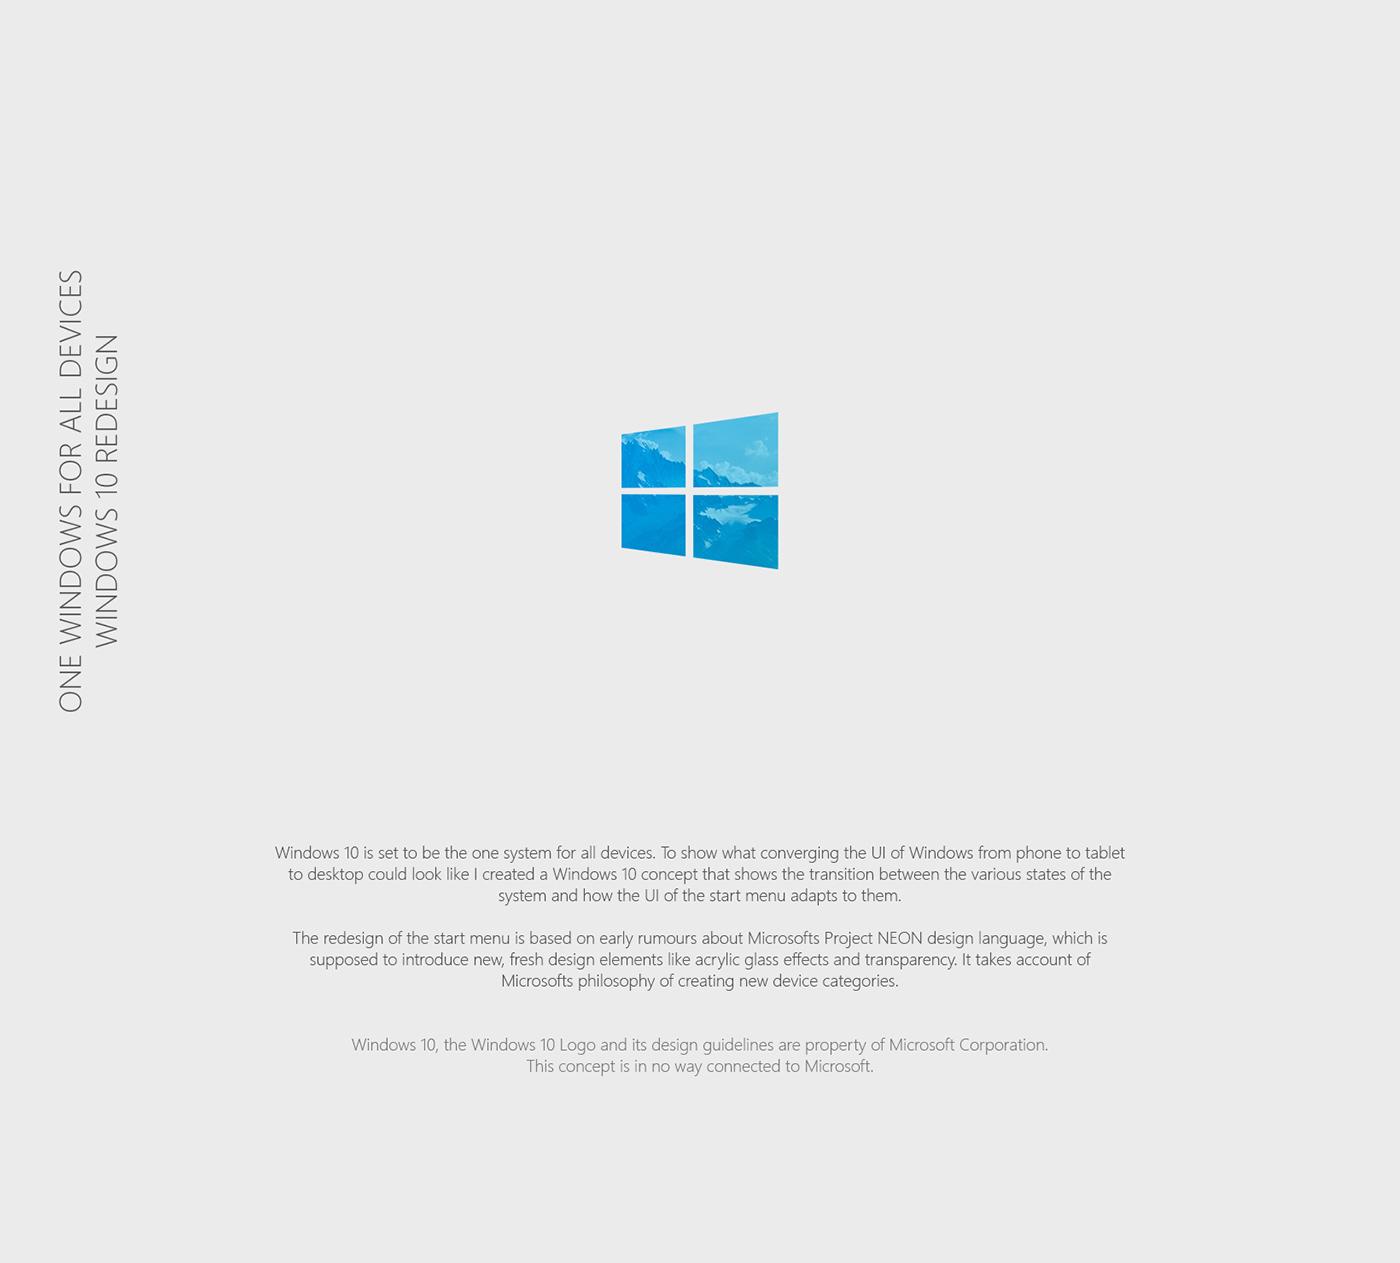 windows 10 windows 10 mobile Project Neon Cshell Microsoft continuum surface phone foldable screen